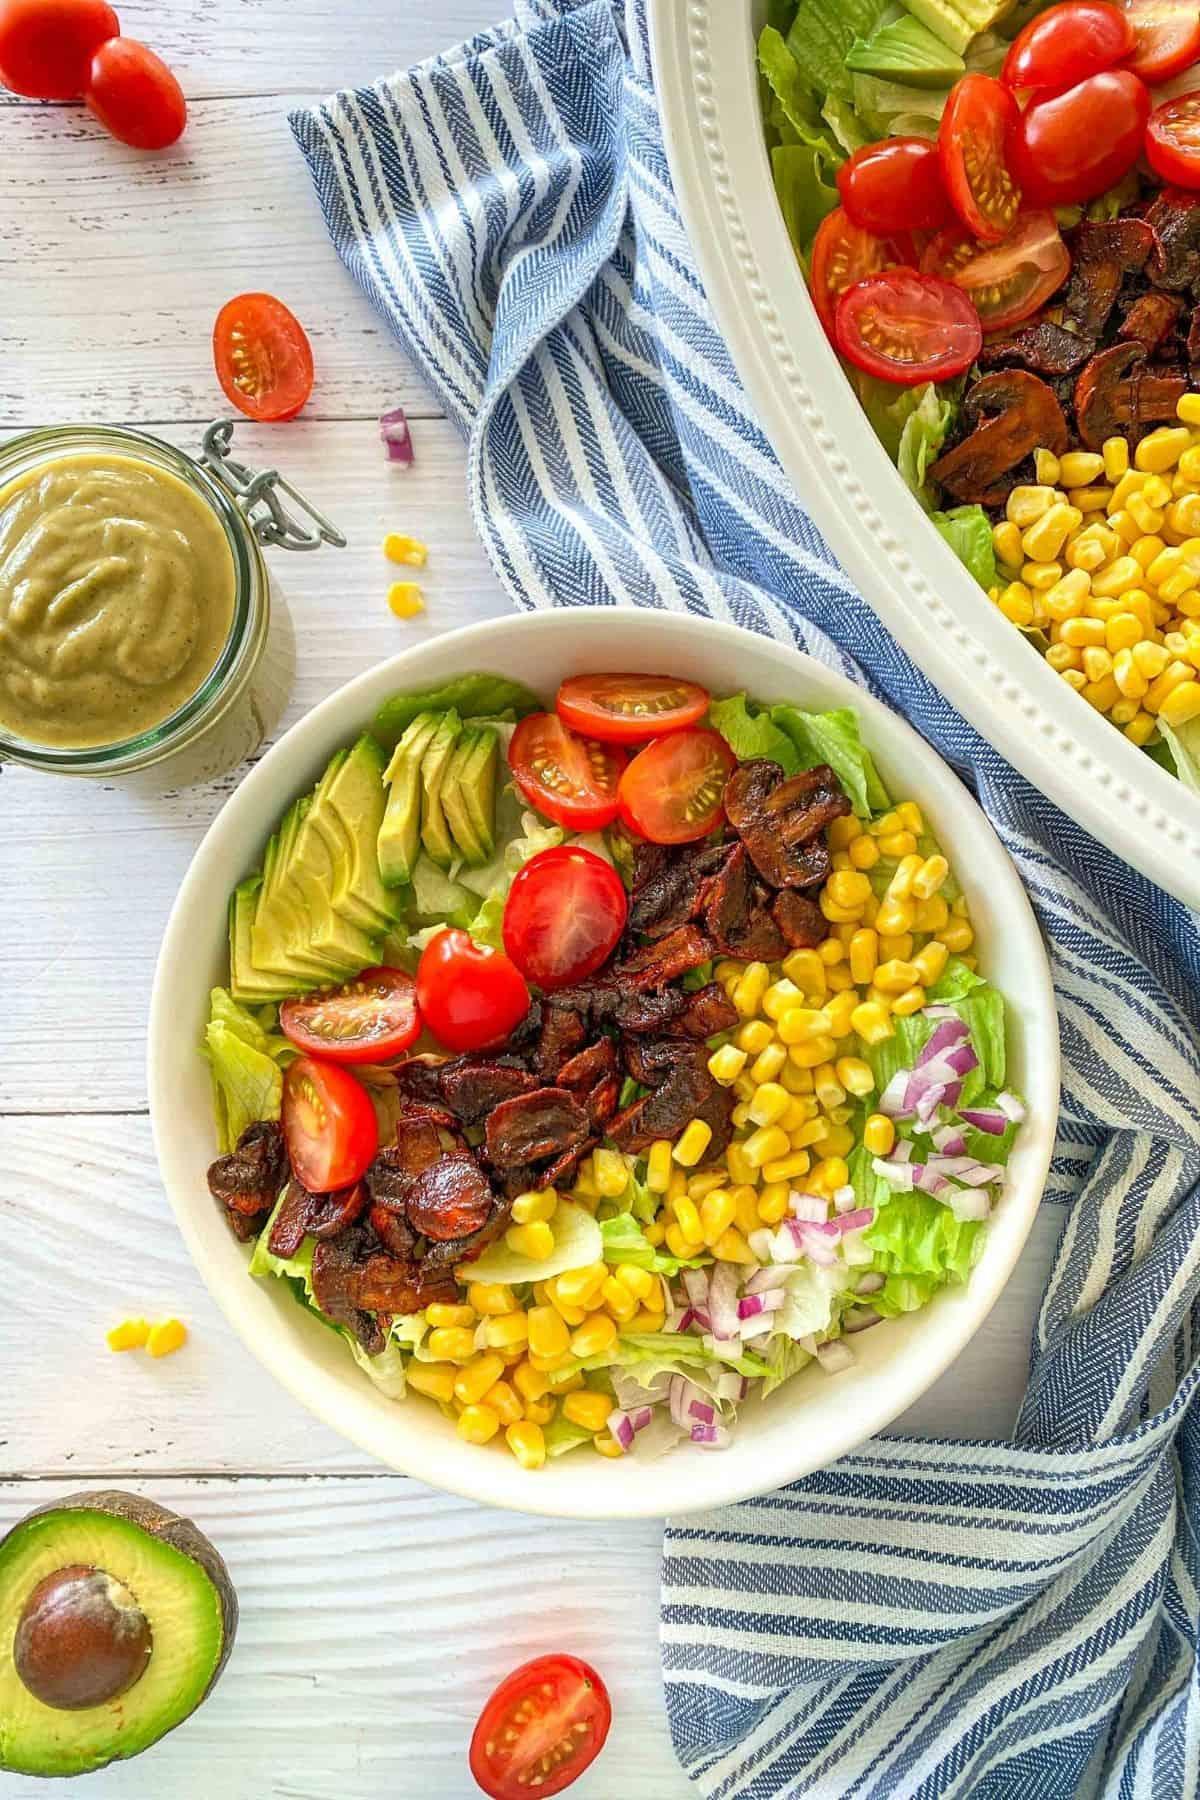 Vegan cobb salad in white bowl with jar of dressing behind it.